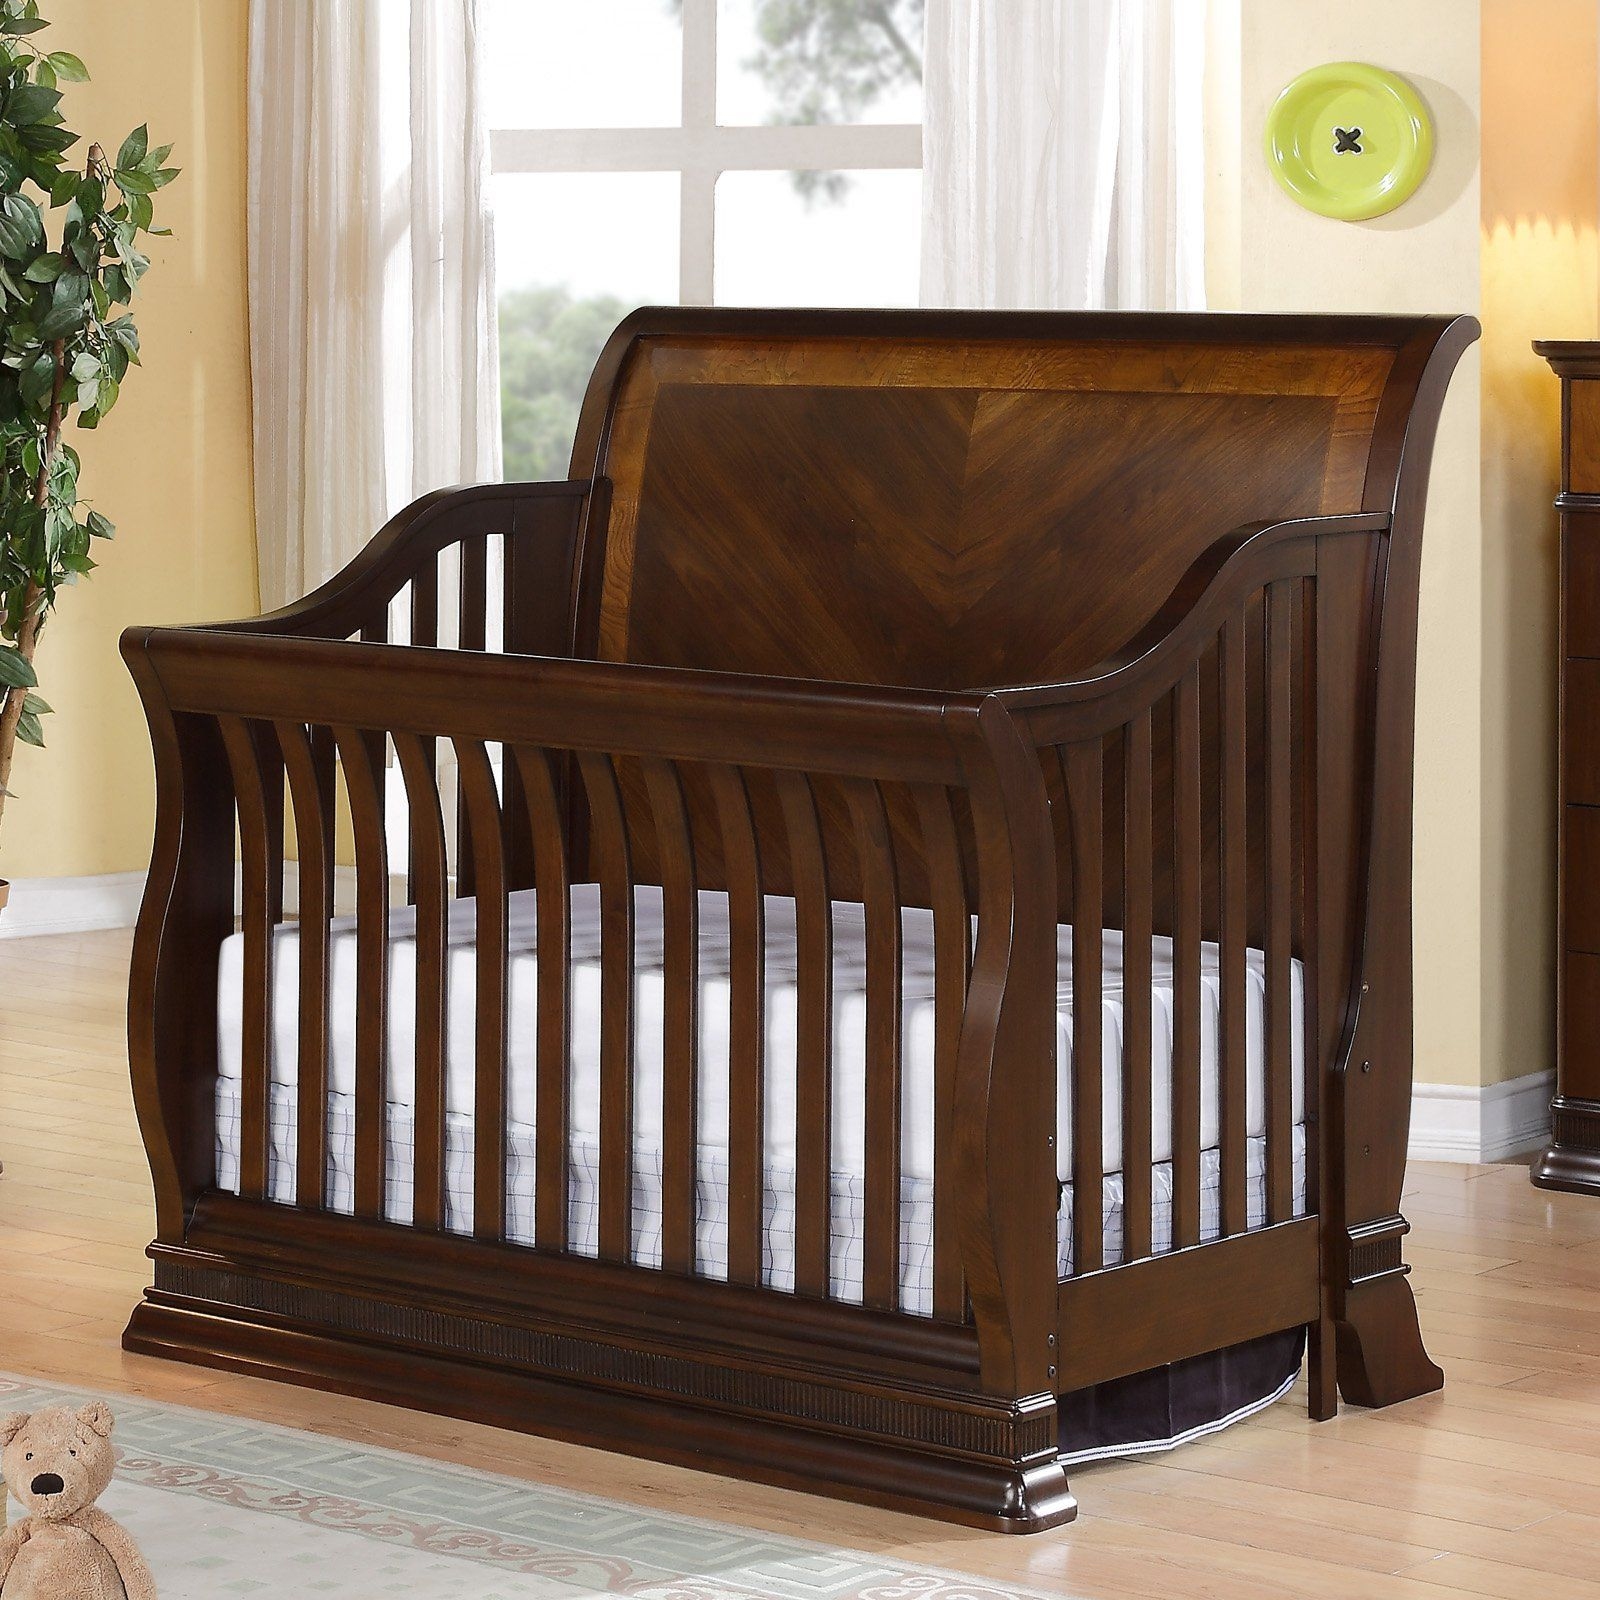 Munire Furniture Portland 4 In 1 Convertible Crib Cinnamon From Hayneedle Com Cribs Convertible Crib Furniture